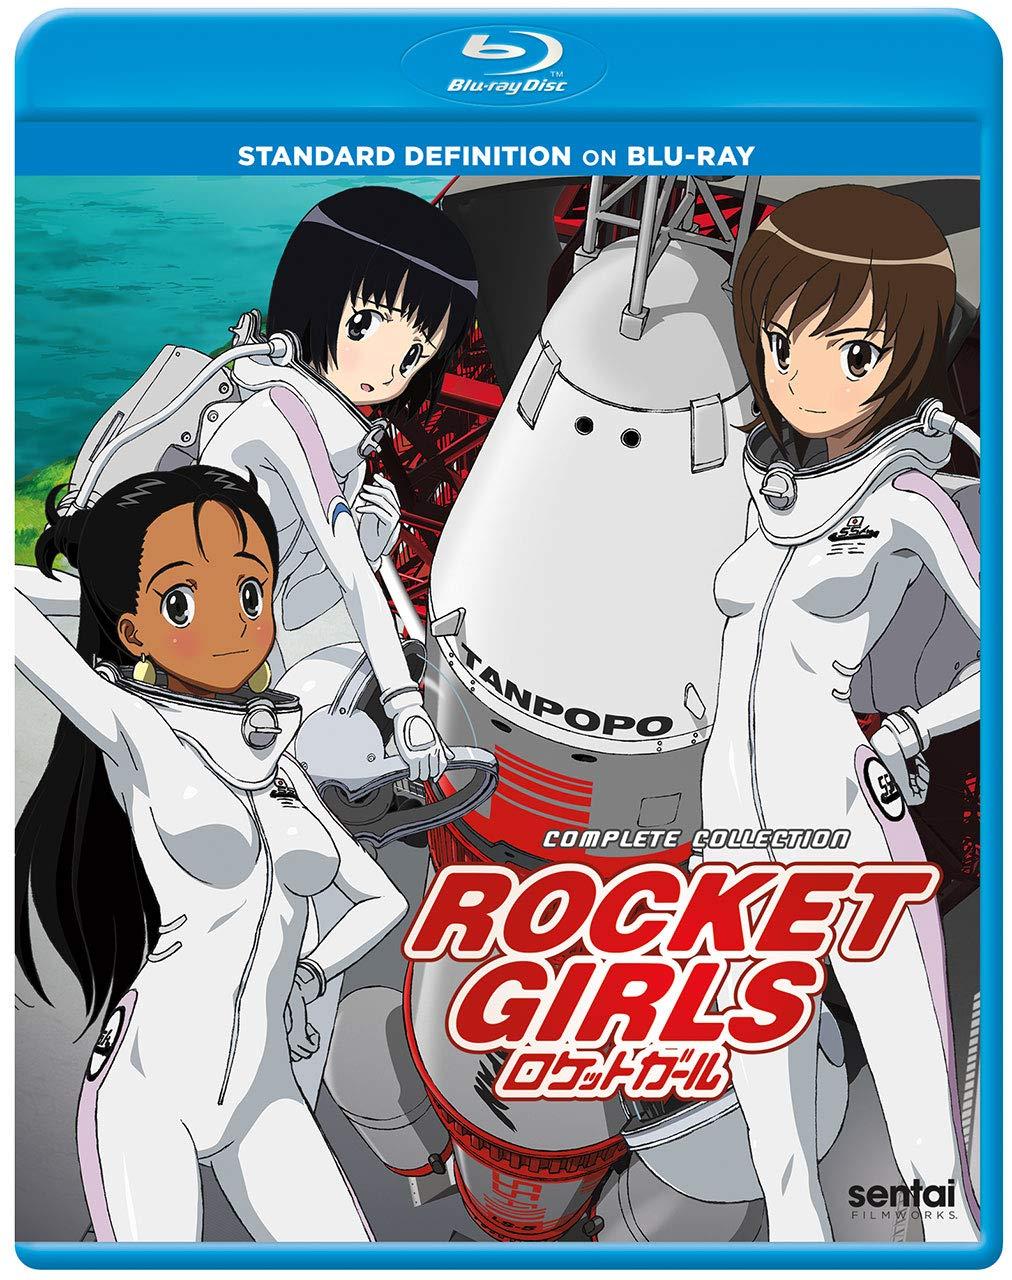 Blu-ray : Rocket Girls (Subtitled, Anamorphic)